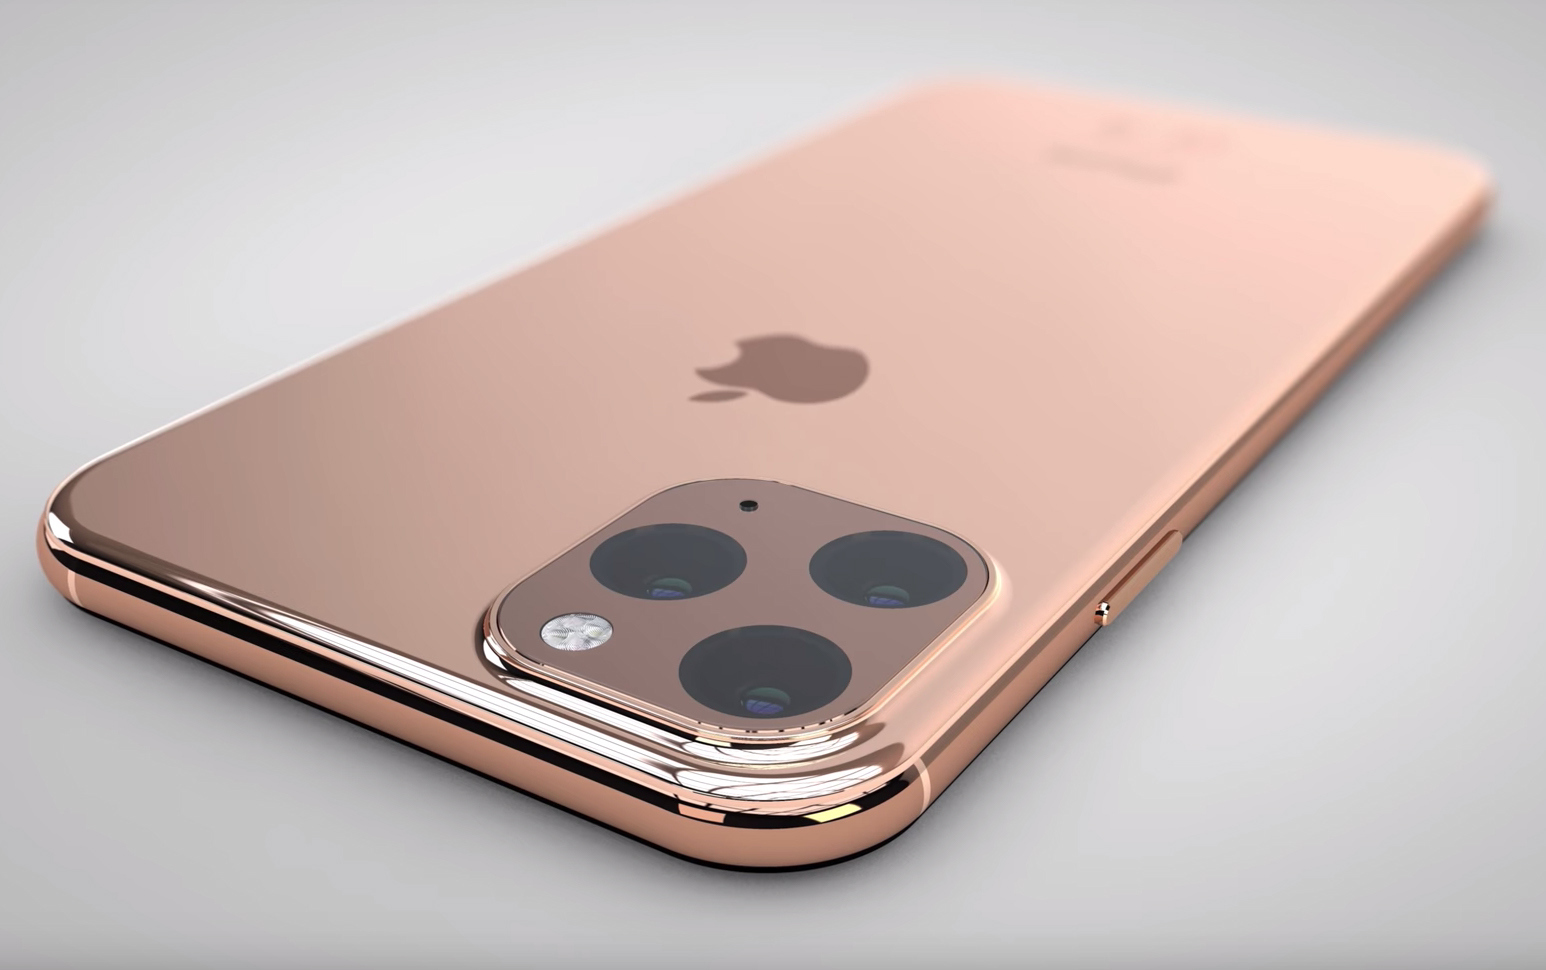 iPhone 11, iPhone XR и iPhone 8_какой из iphone выбрать - камеры iPhone 11 Pro Max